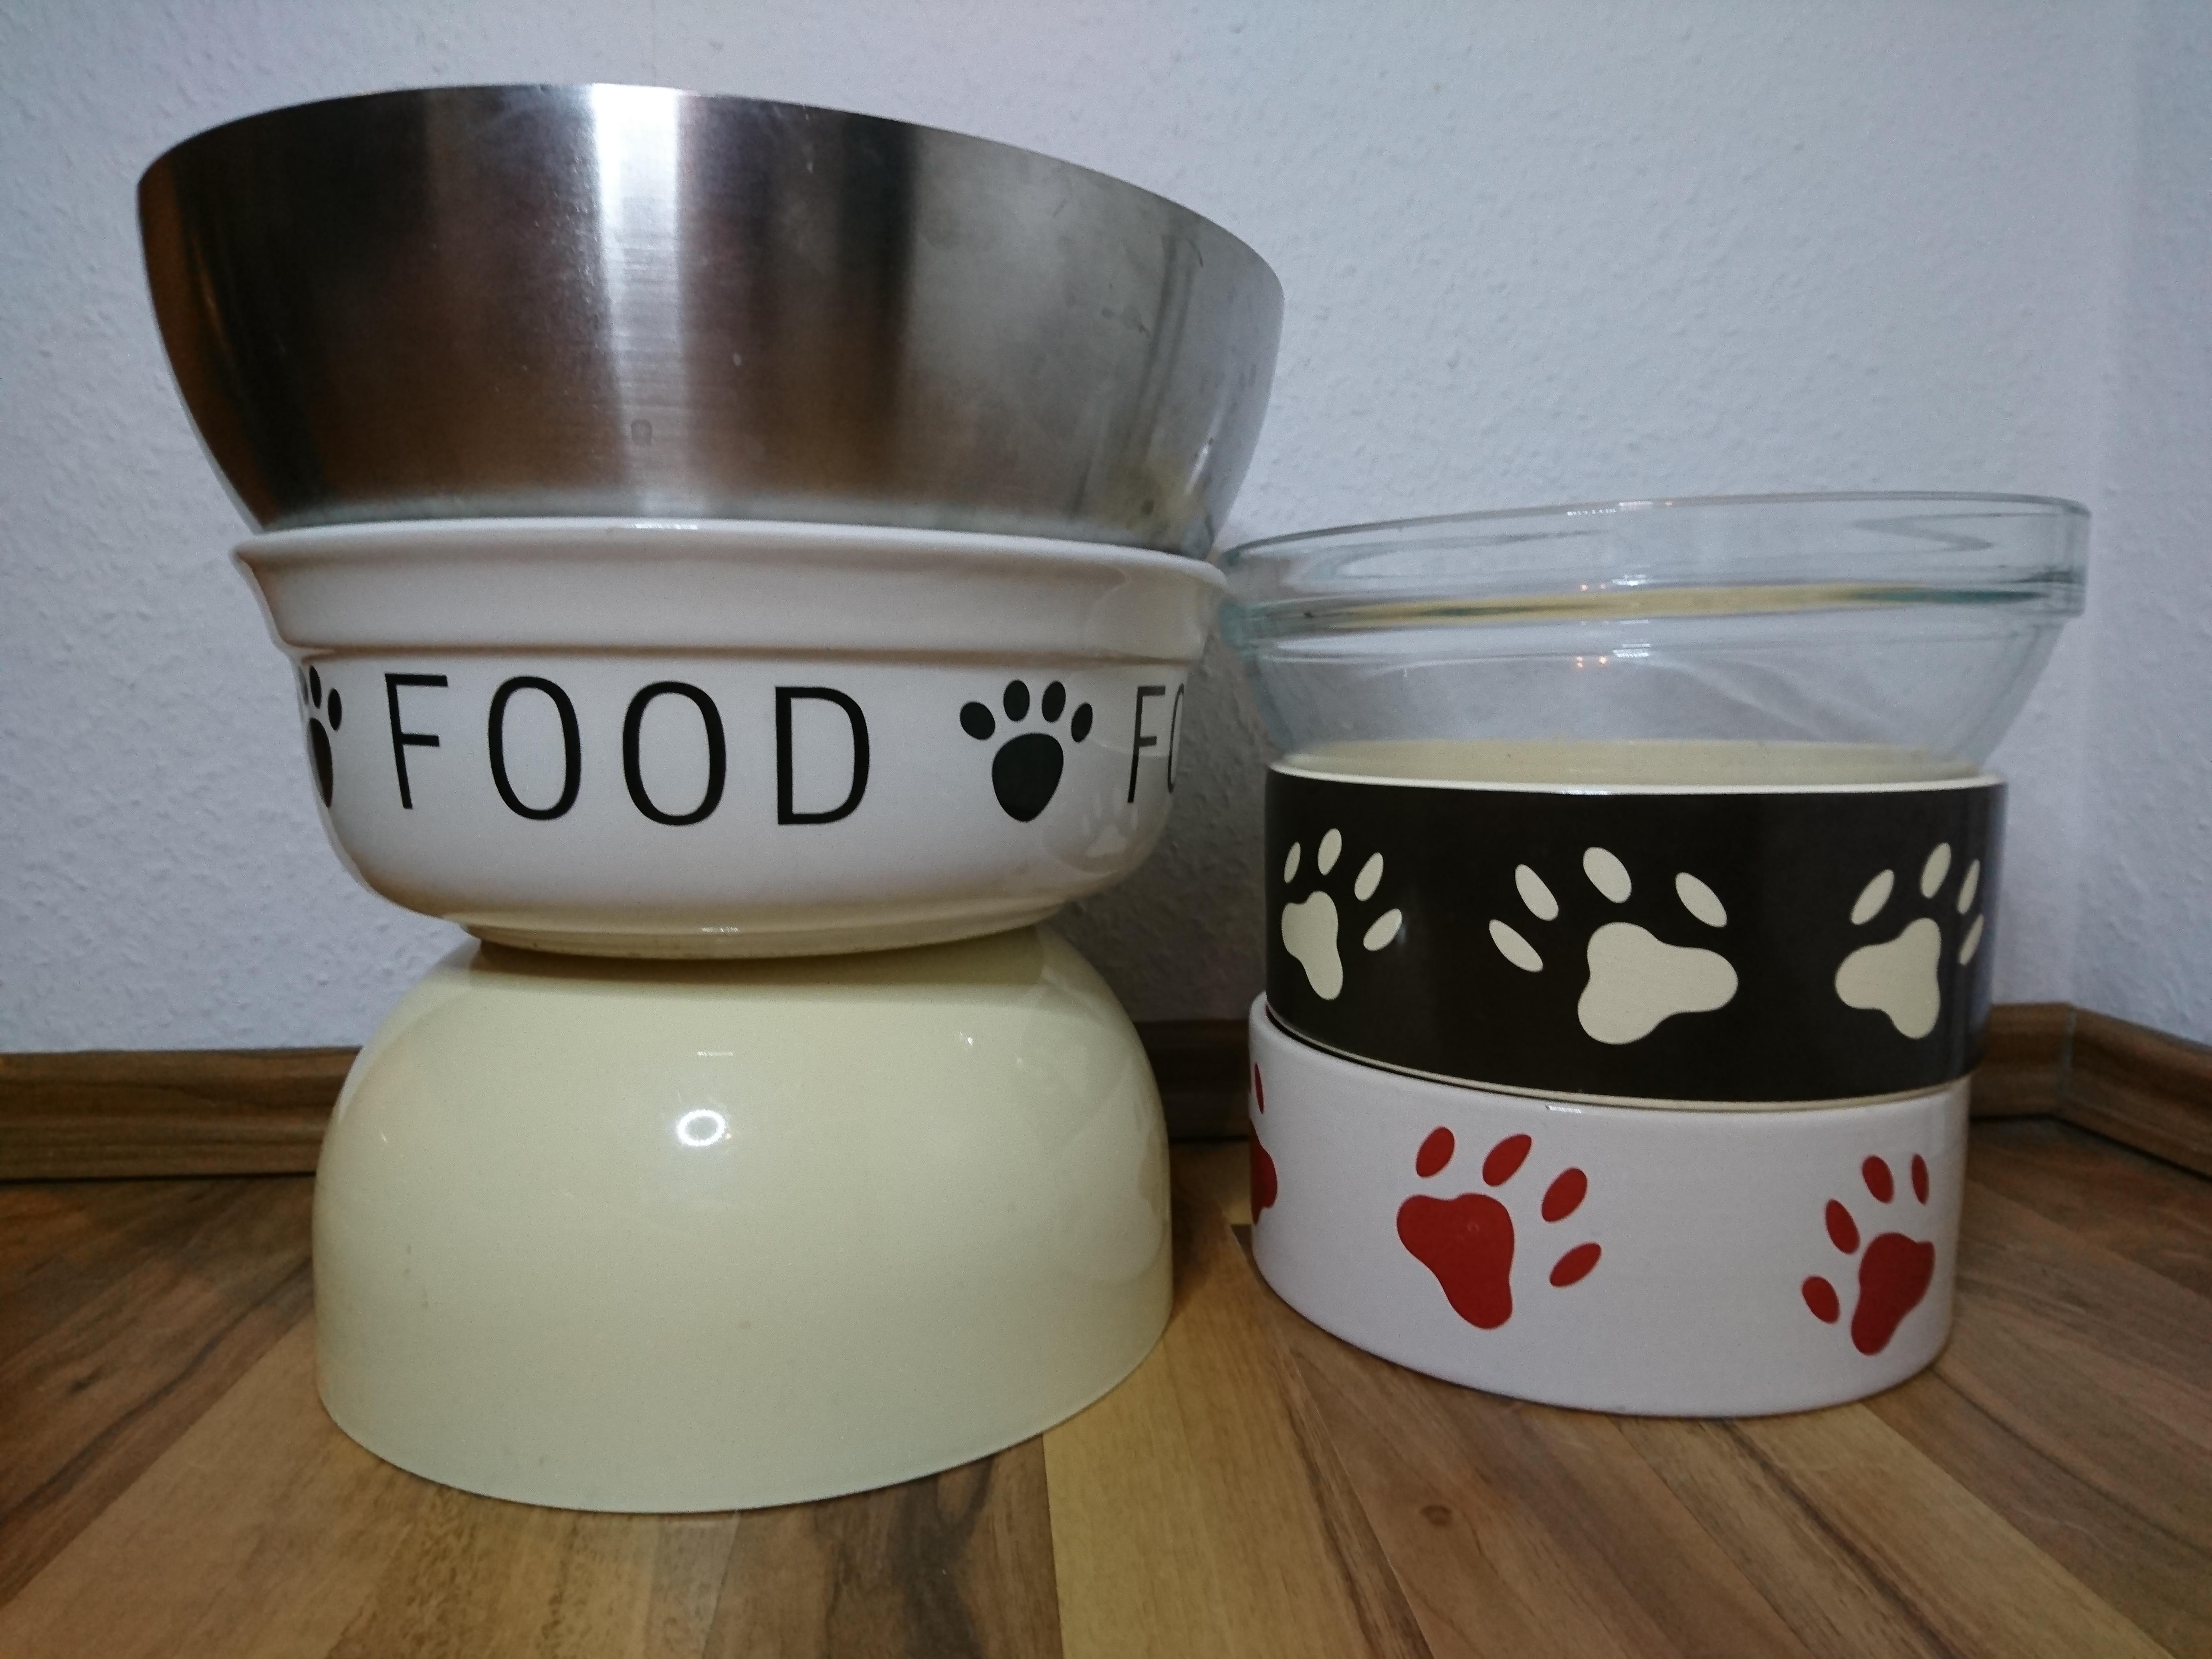 Napf Futter Füttern Glas Malous Rabaukenbande Keramik Porzellan Metall Napf Plastik Katze Hund Blog